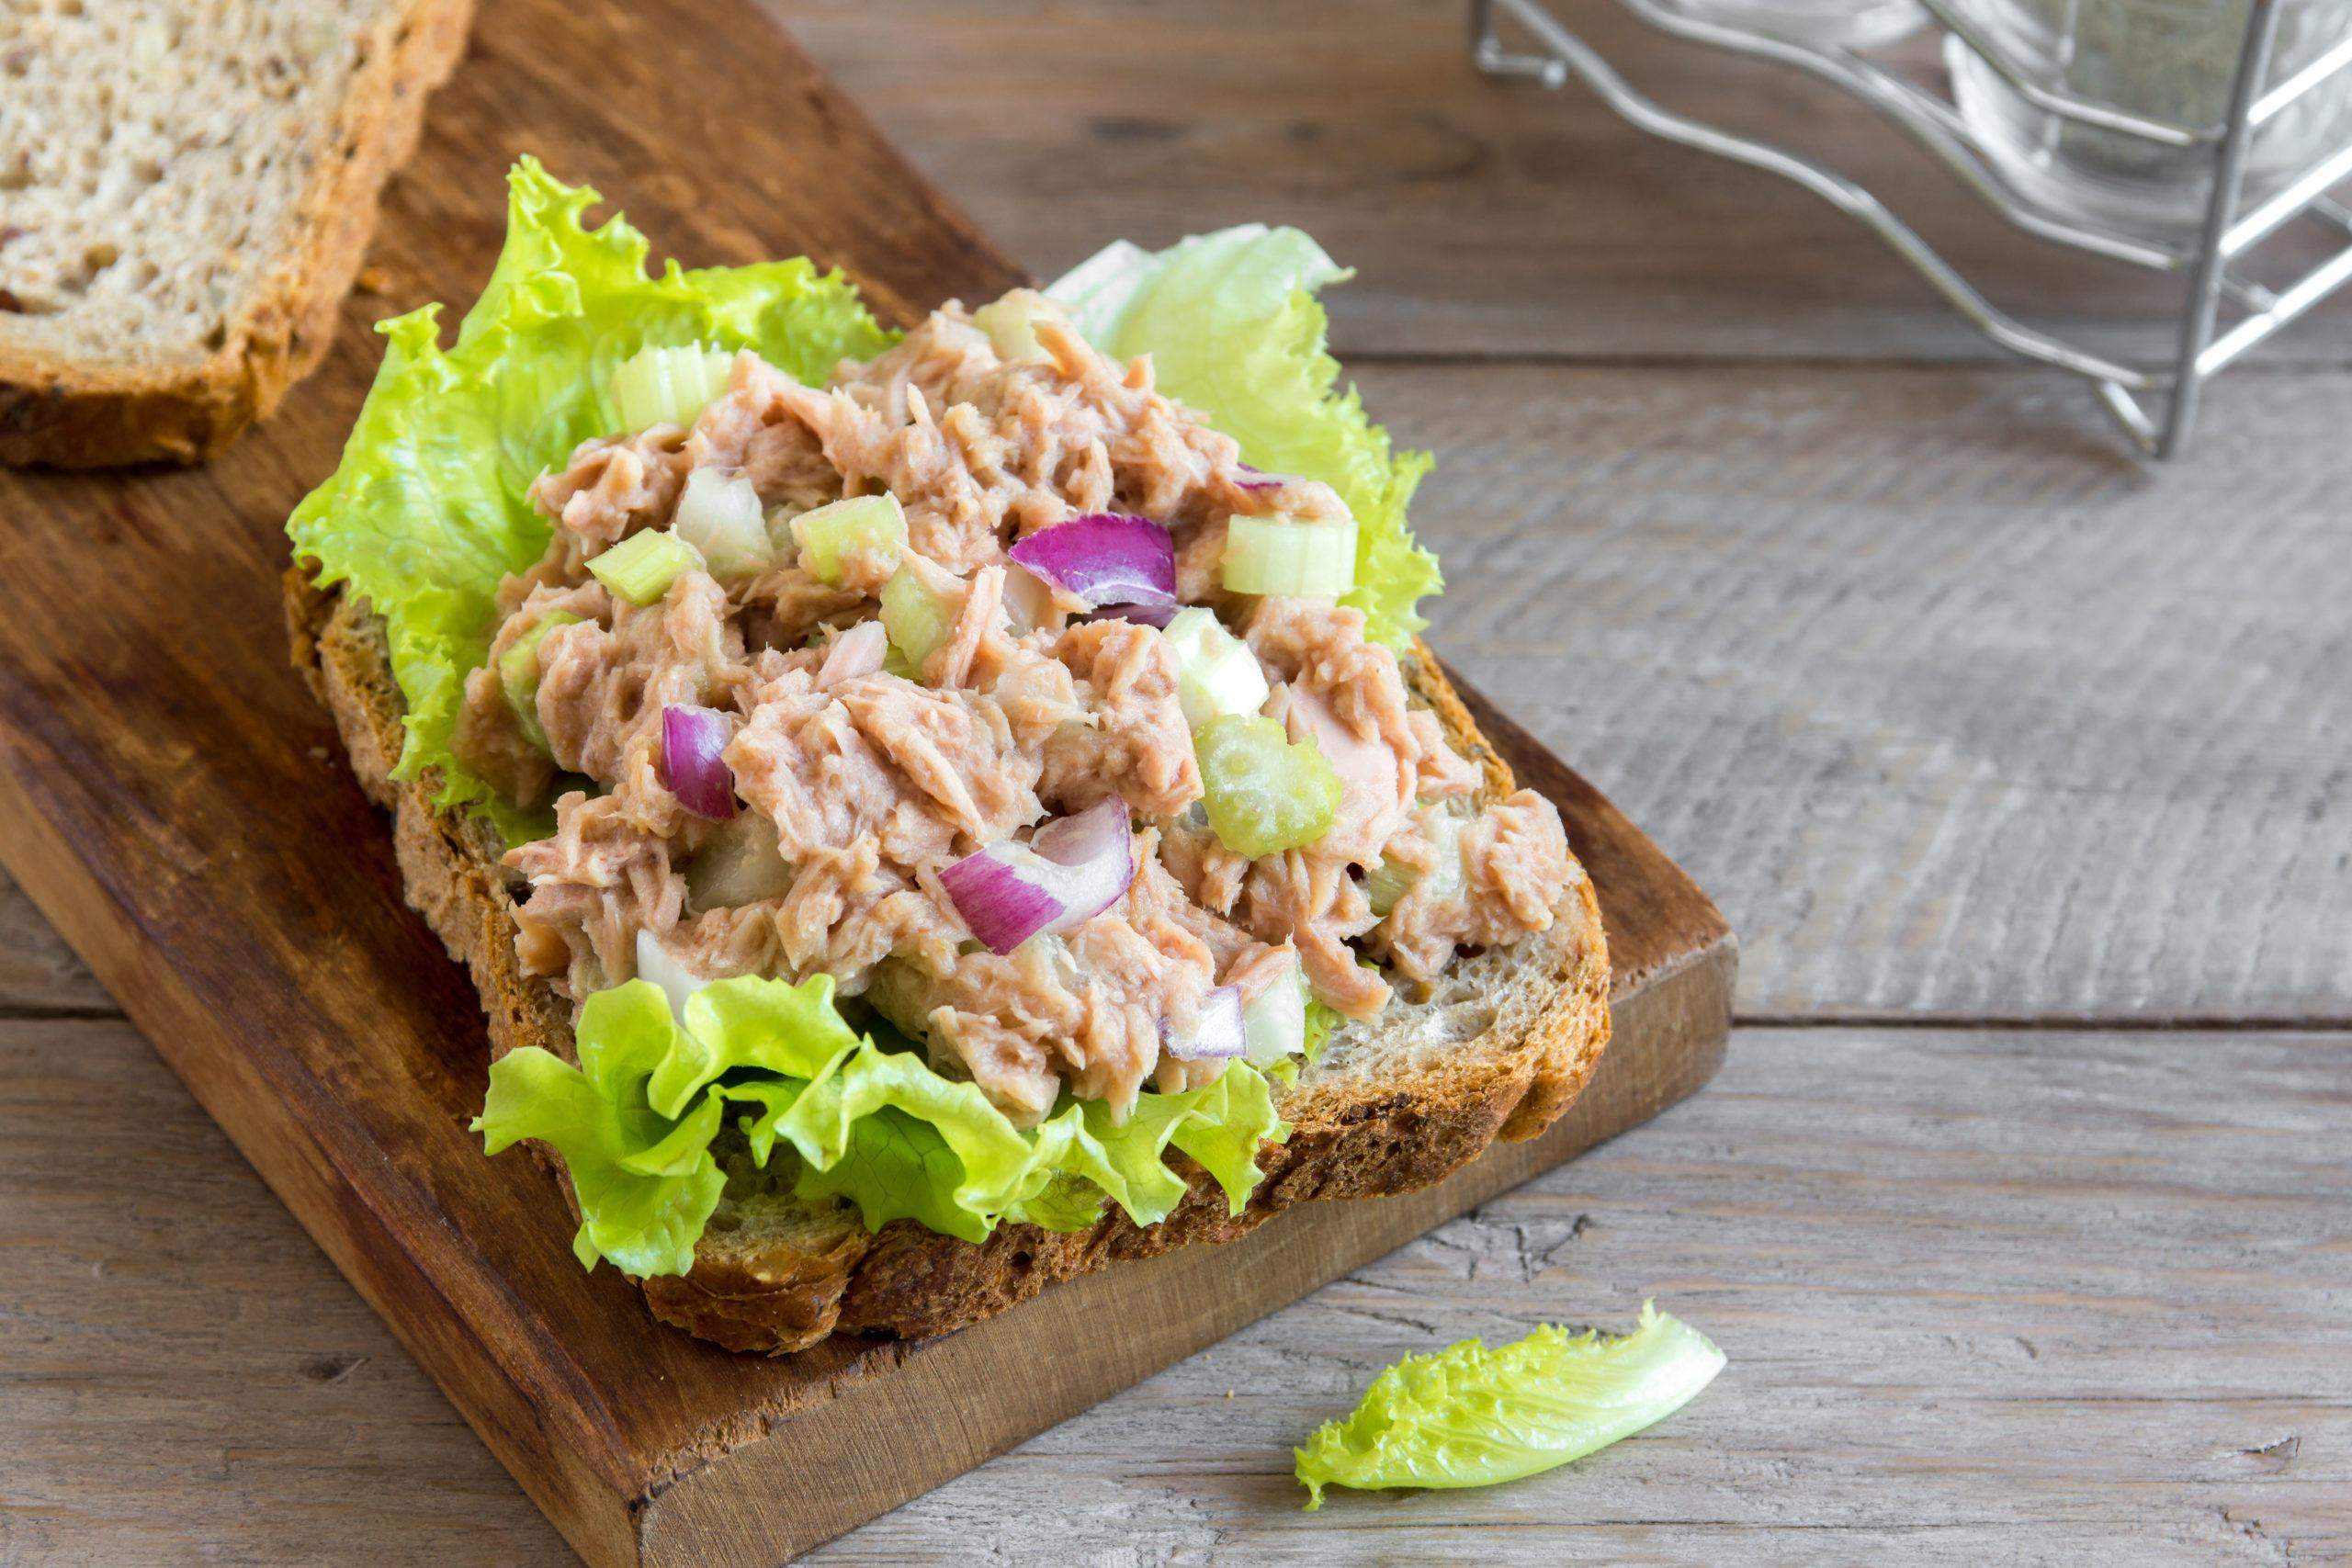 The Scoop with Lea | Mediterranean Tuna Salad 2